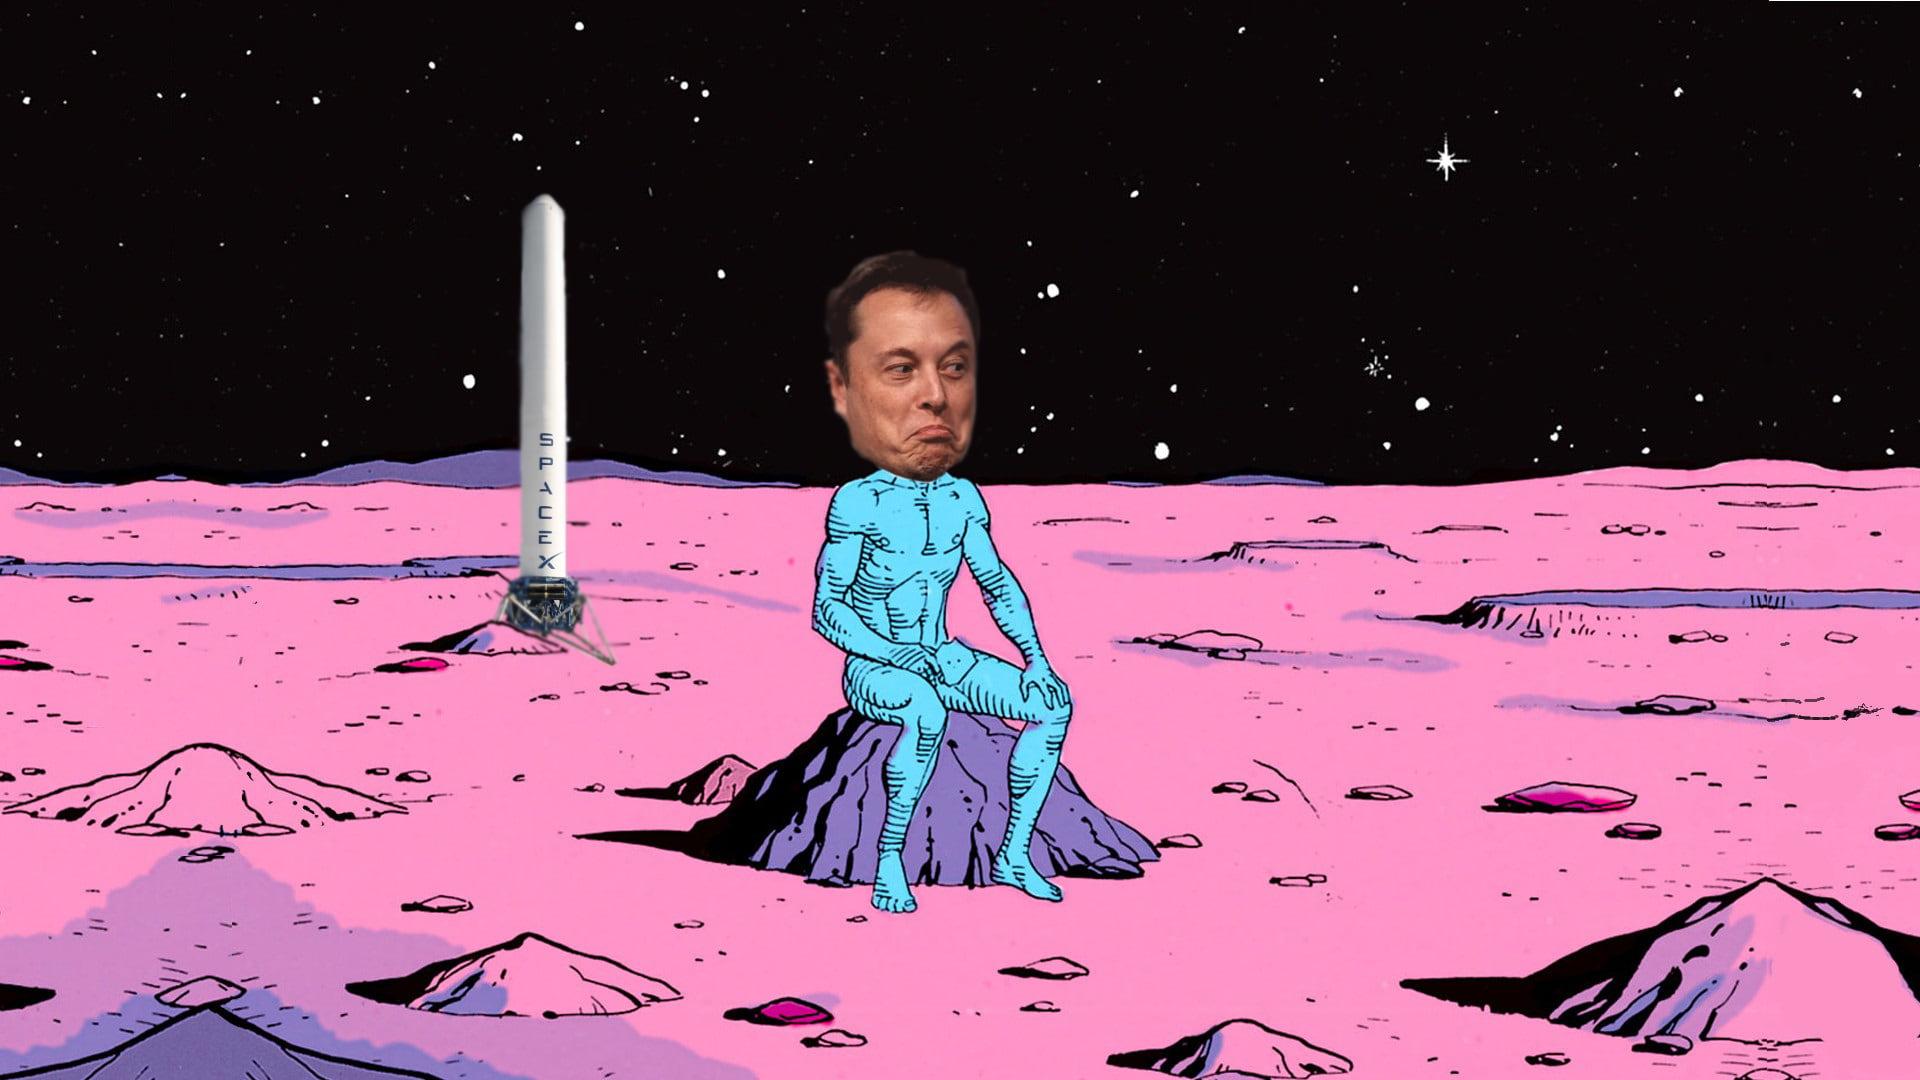 elon musk goes to mars